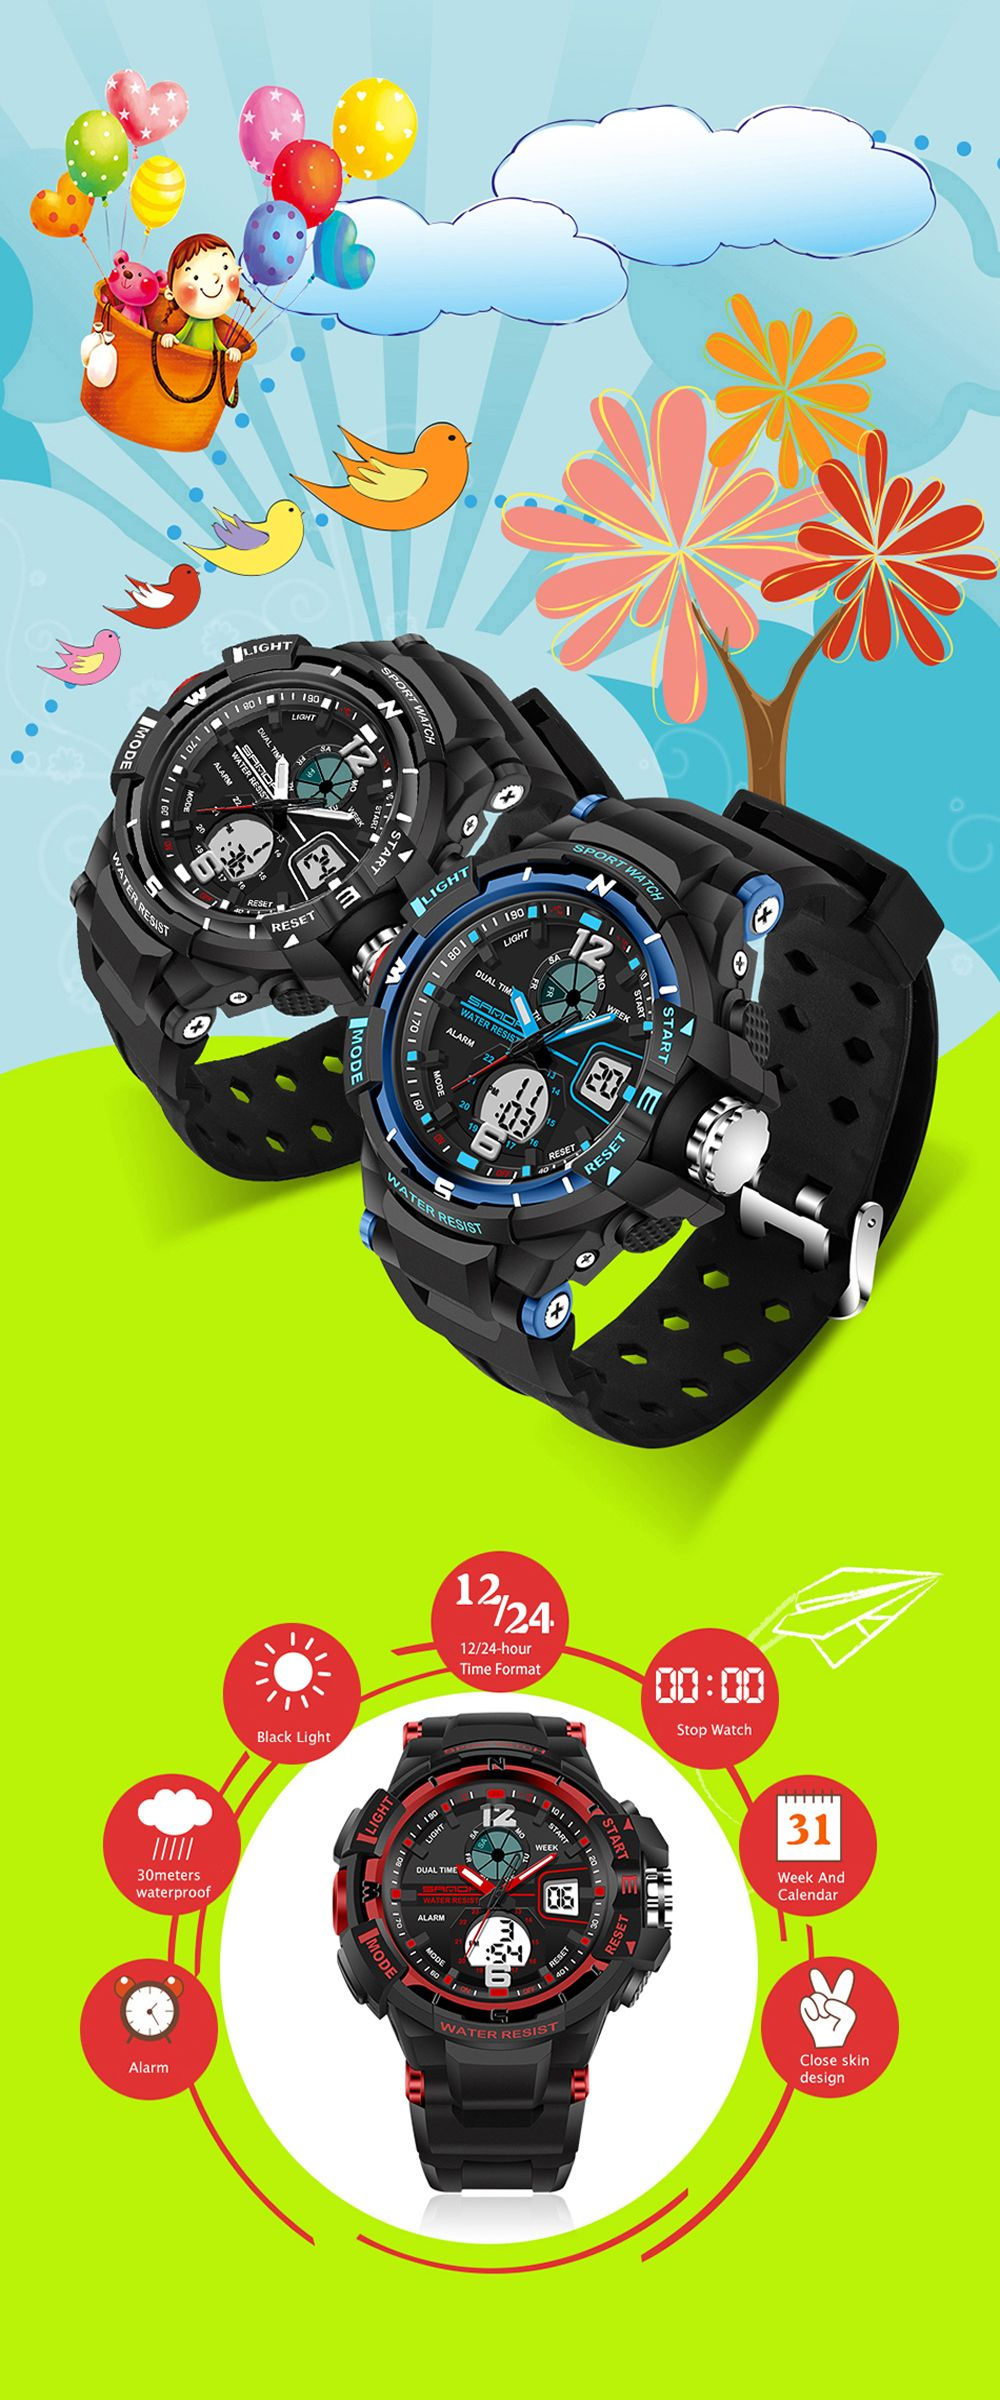 SANDA Large 5319 Fashion Outdoor Sports Men Watch Luminous Watch with Box